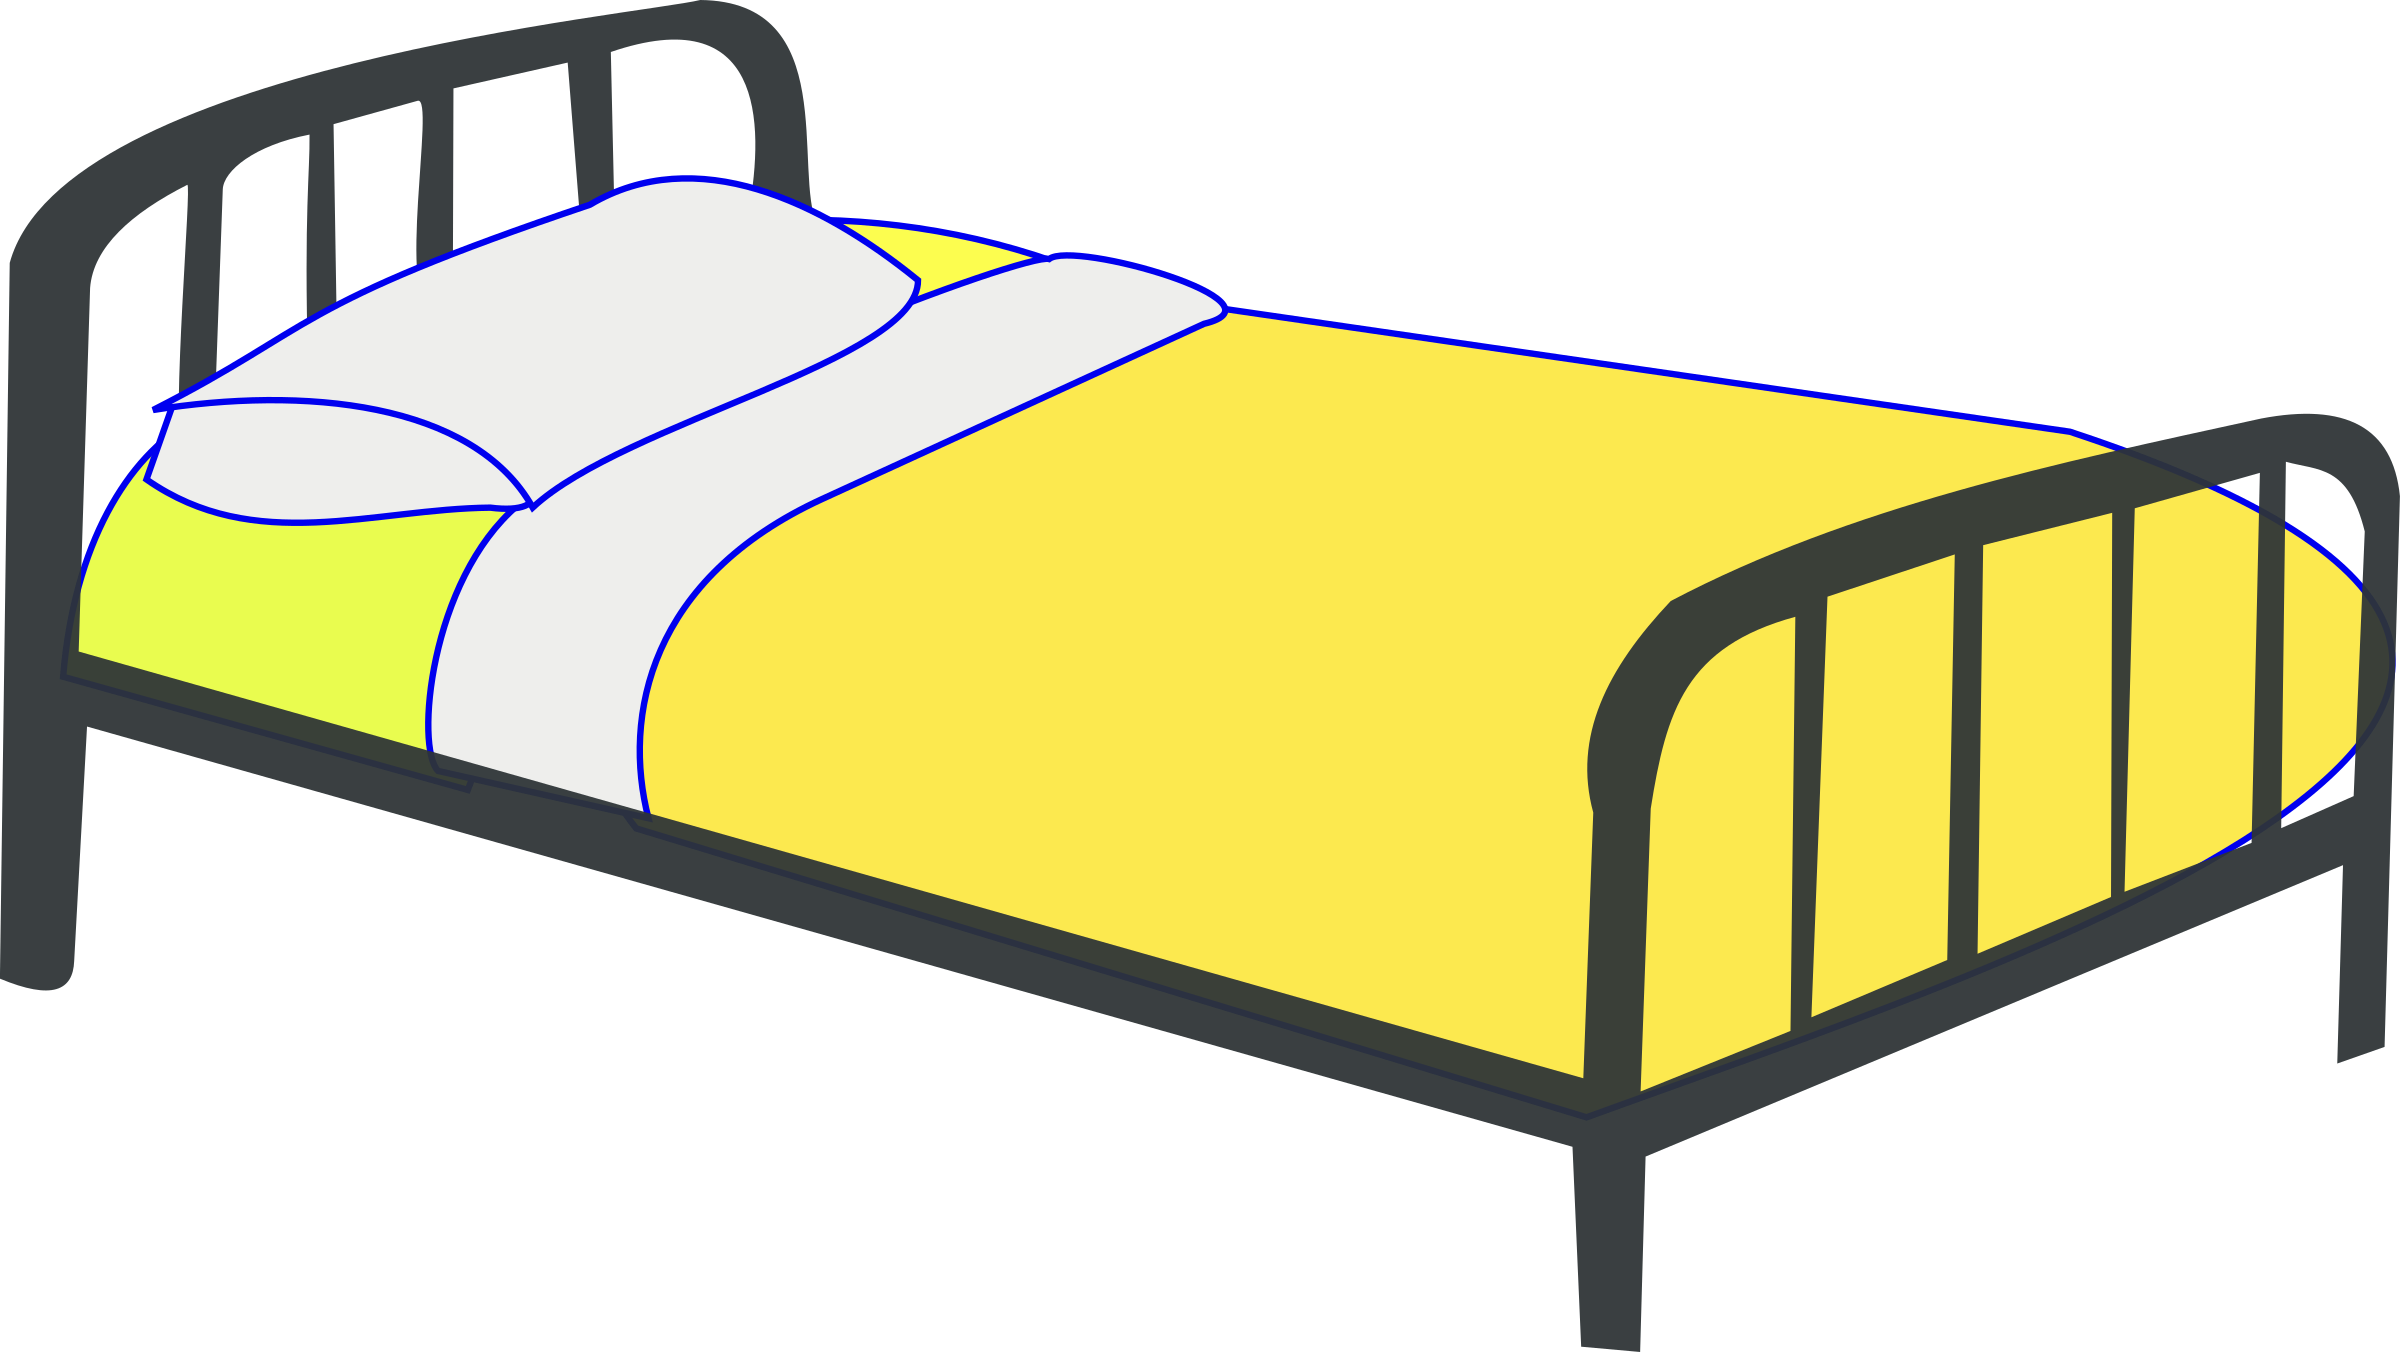 Single big image png. Wet clipart wet bed